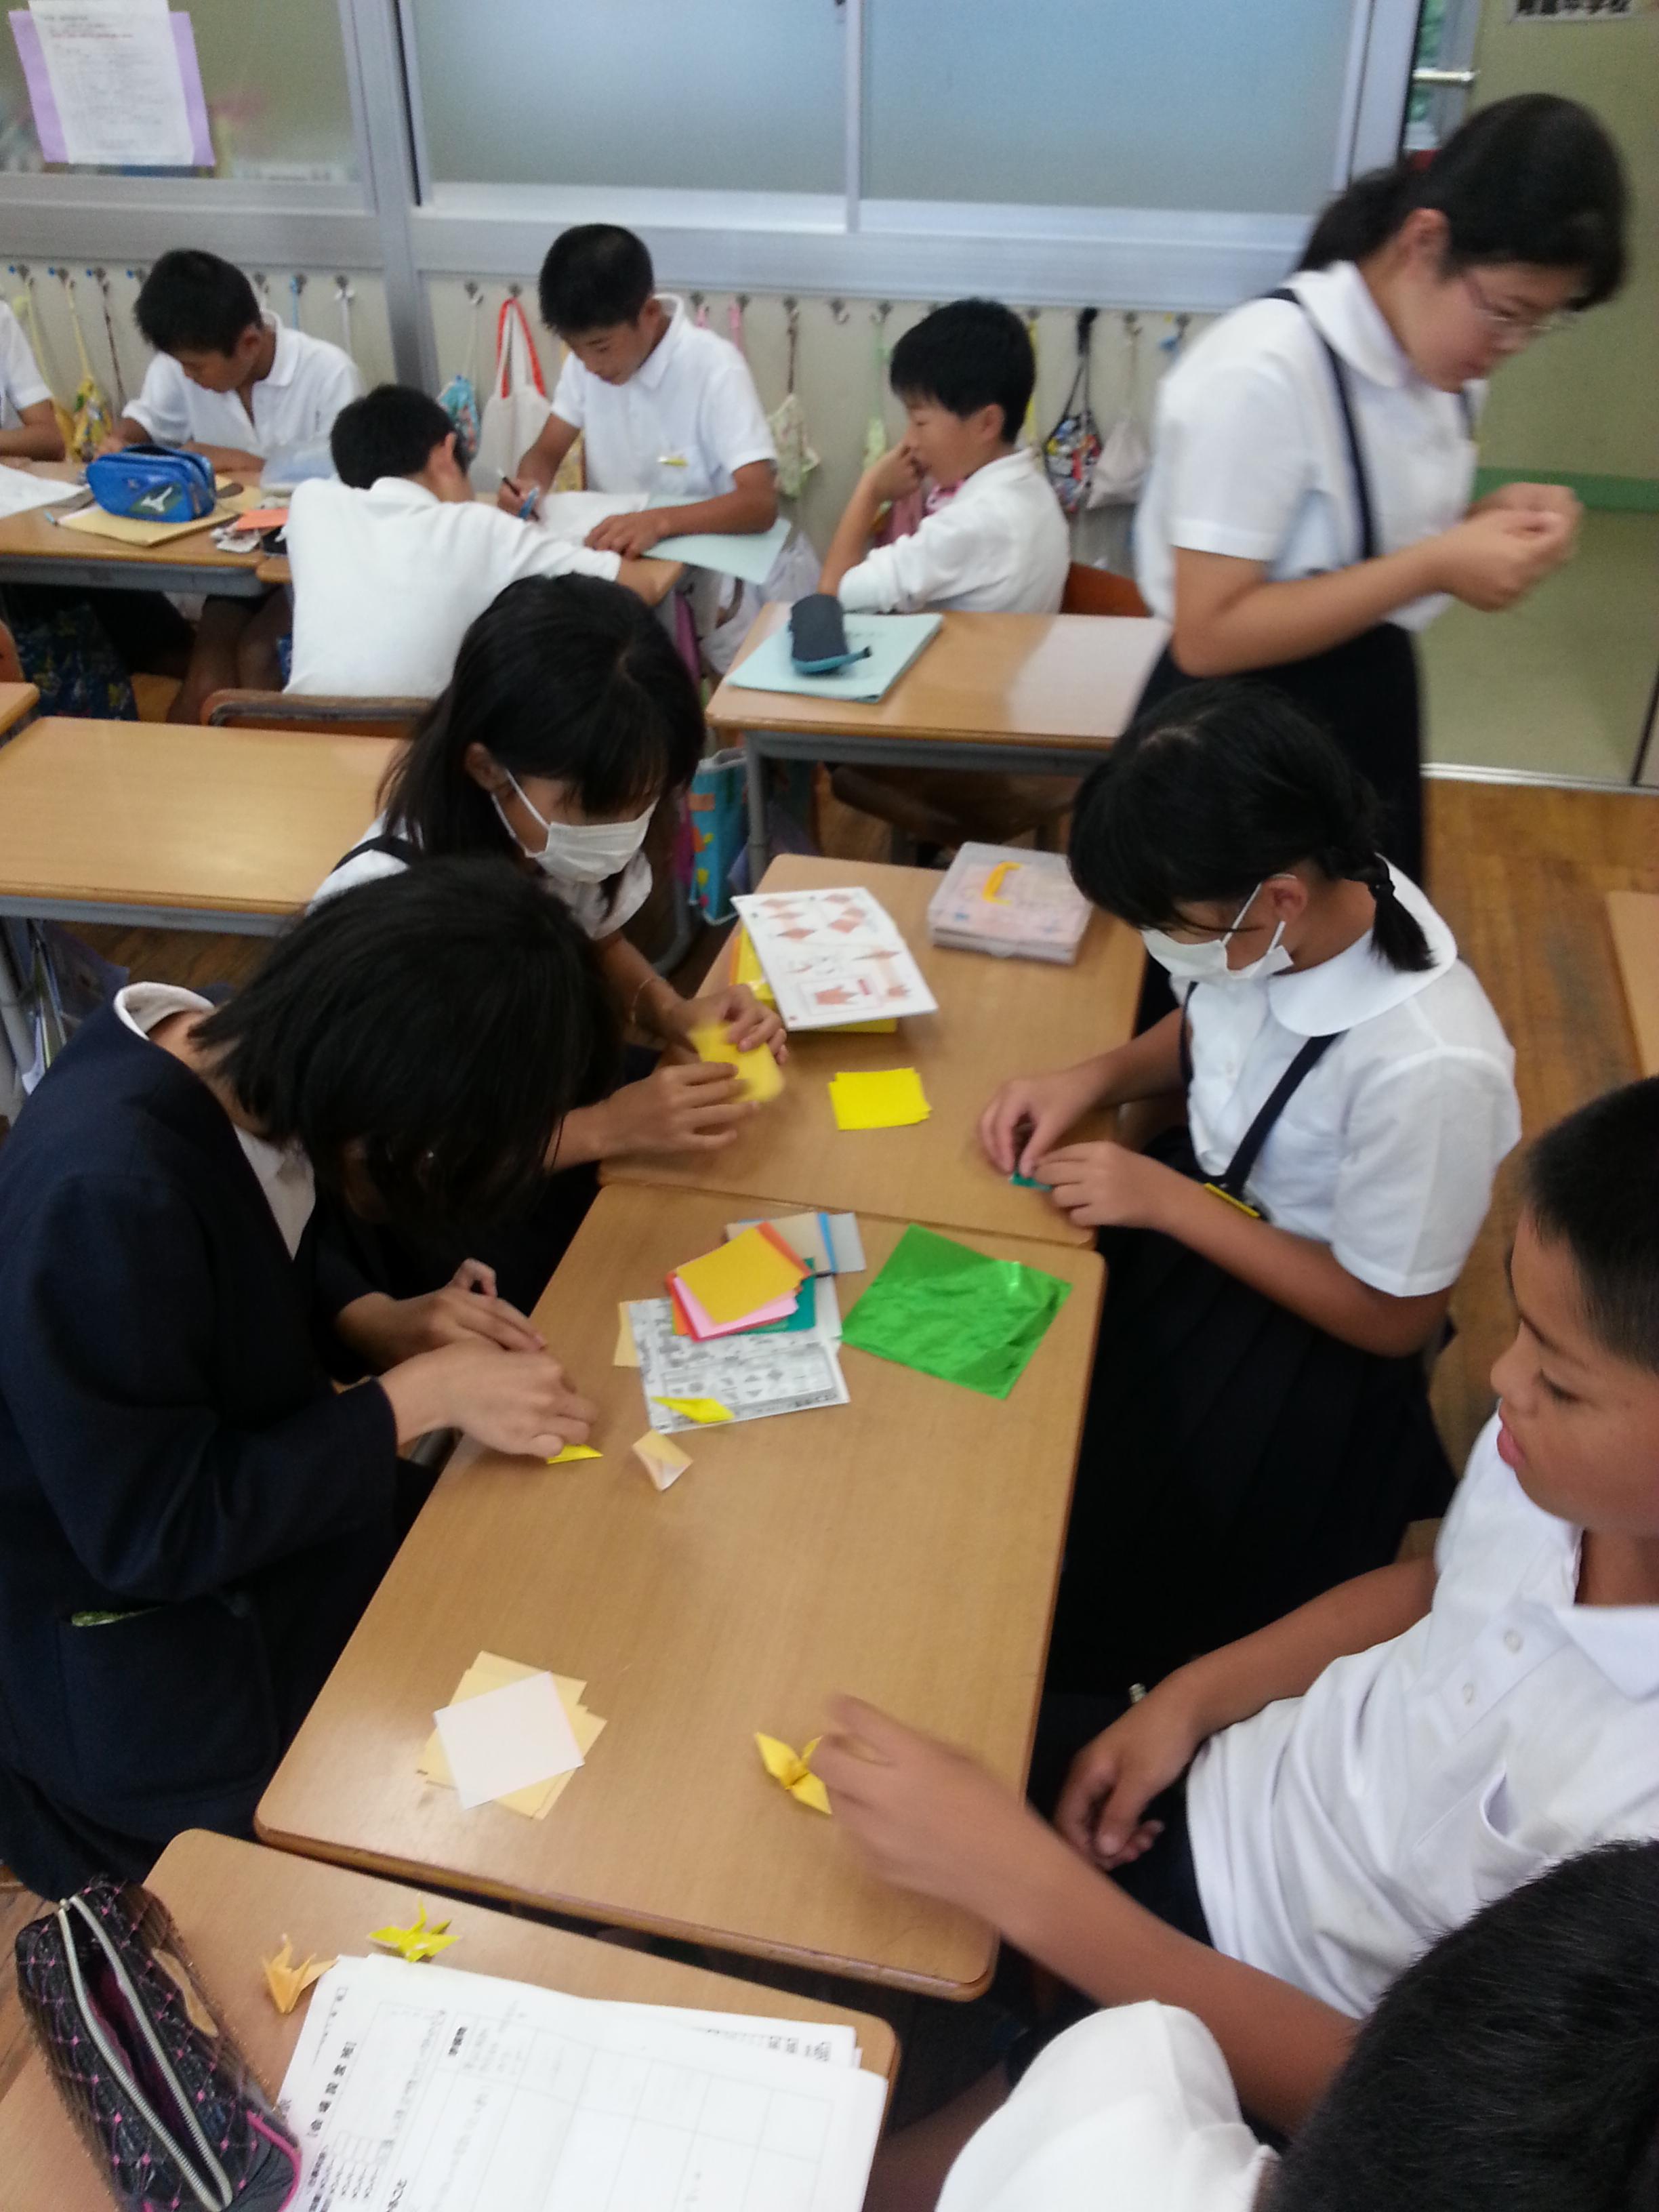 15-09-17-09-46-20-757_photo.jpg